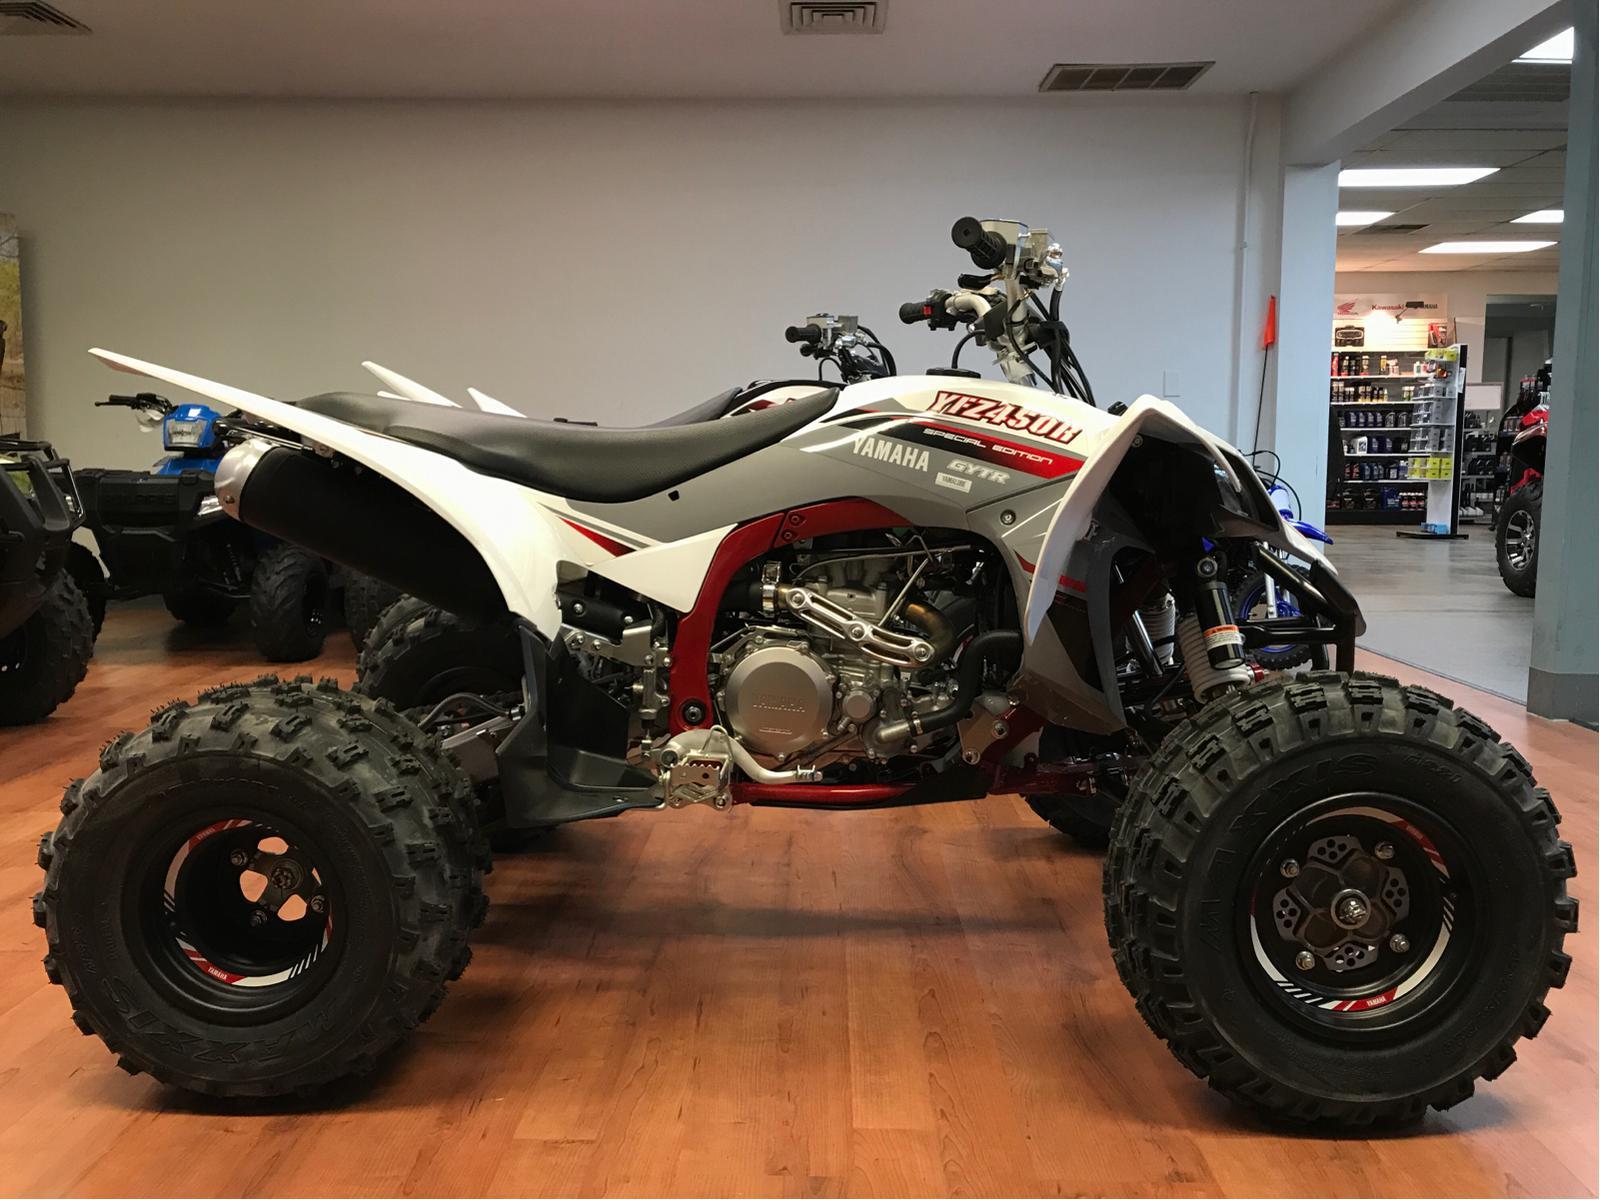 2018 Yamaha YFZ-450R for sale in Urbana, IL | Sportland Motorsports